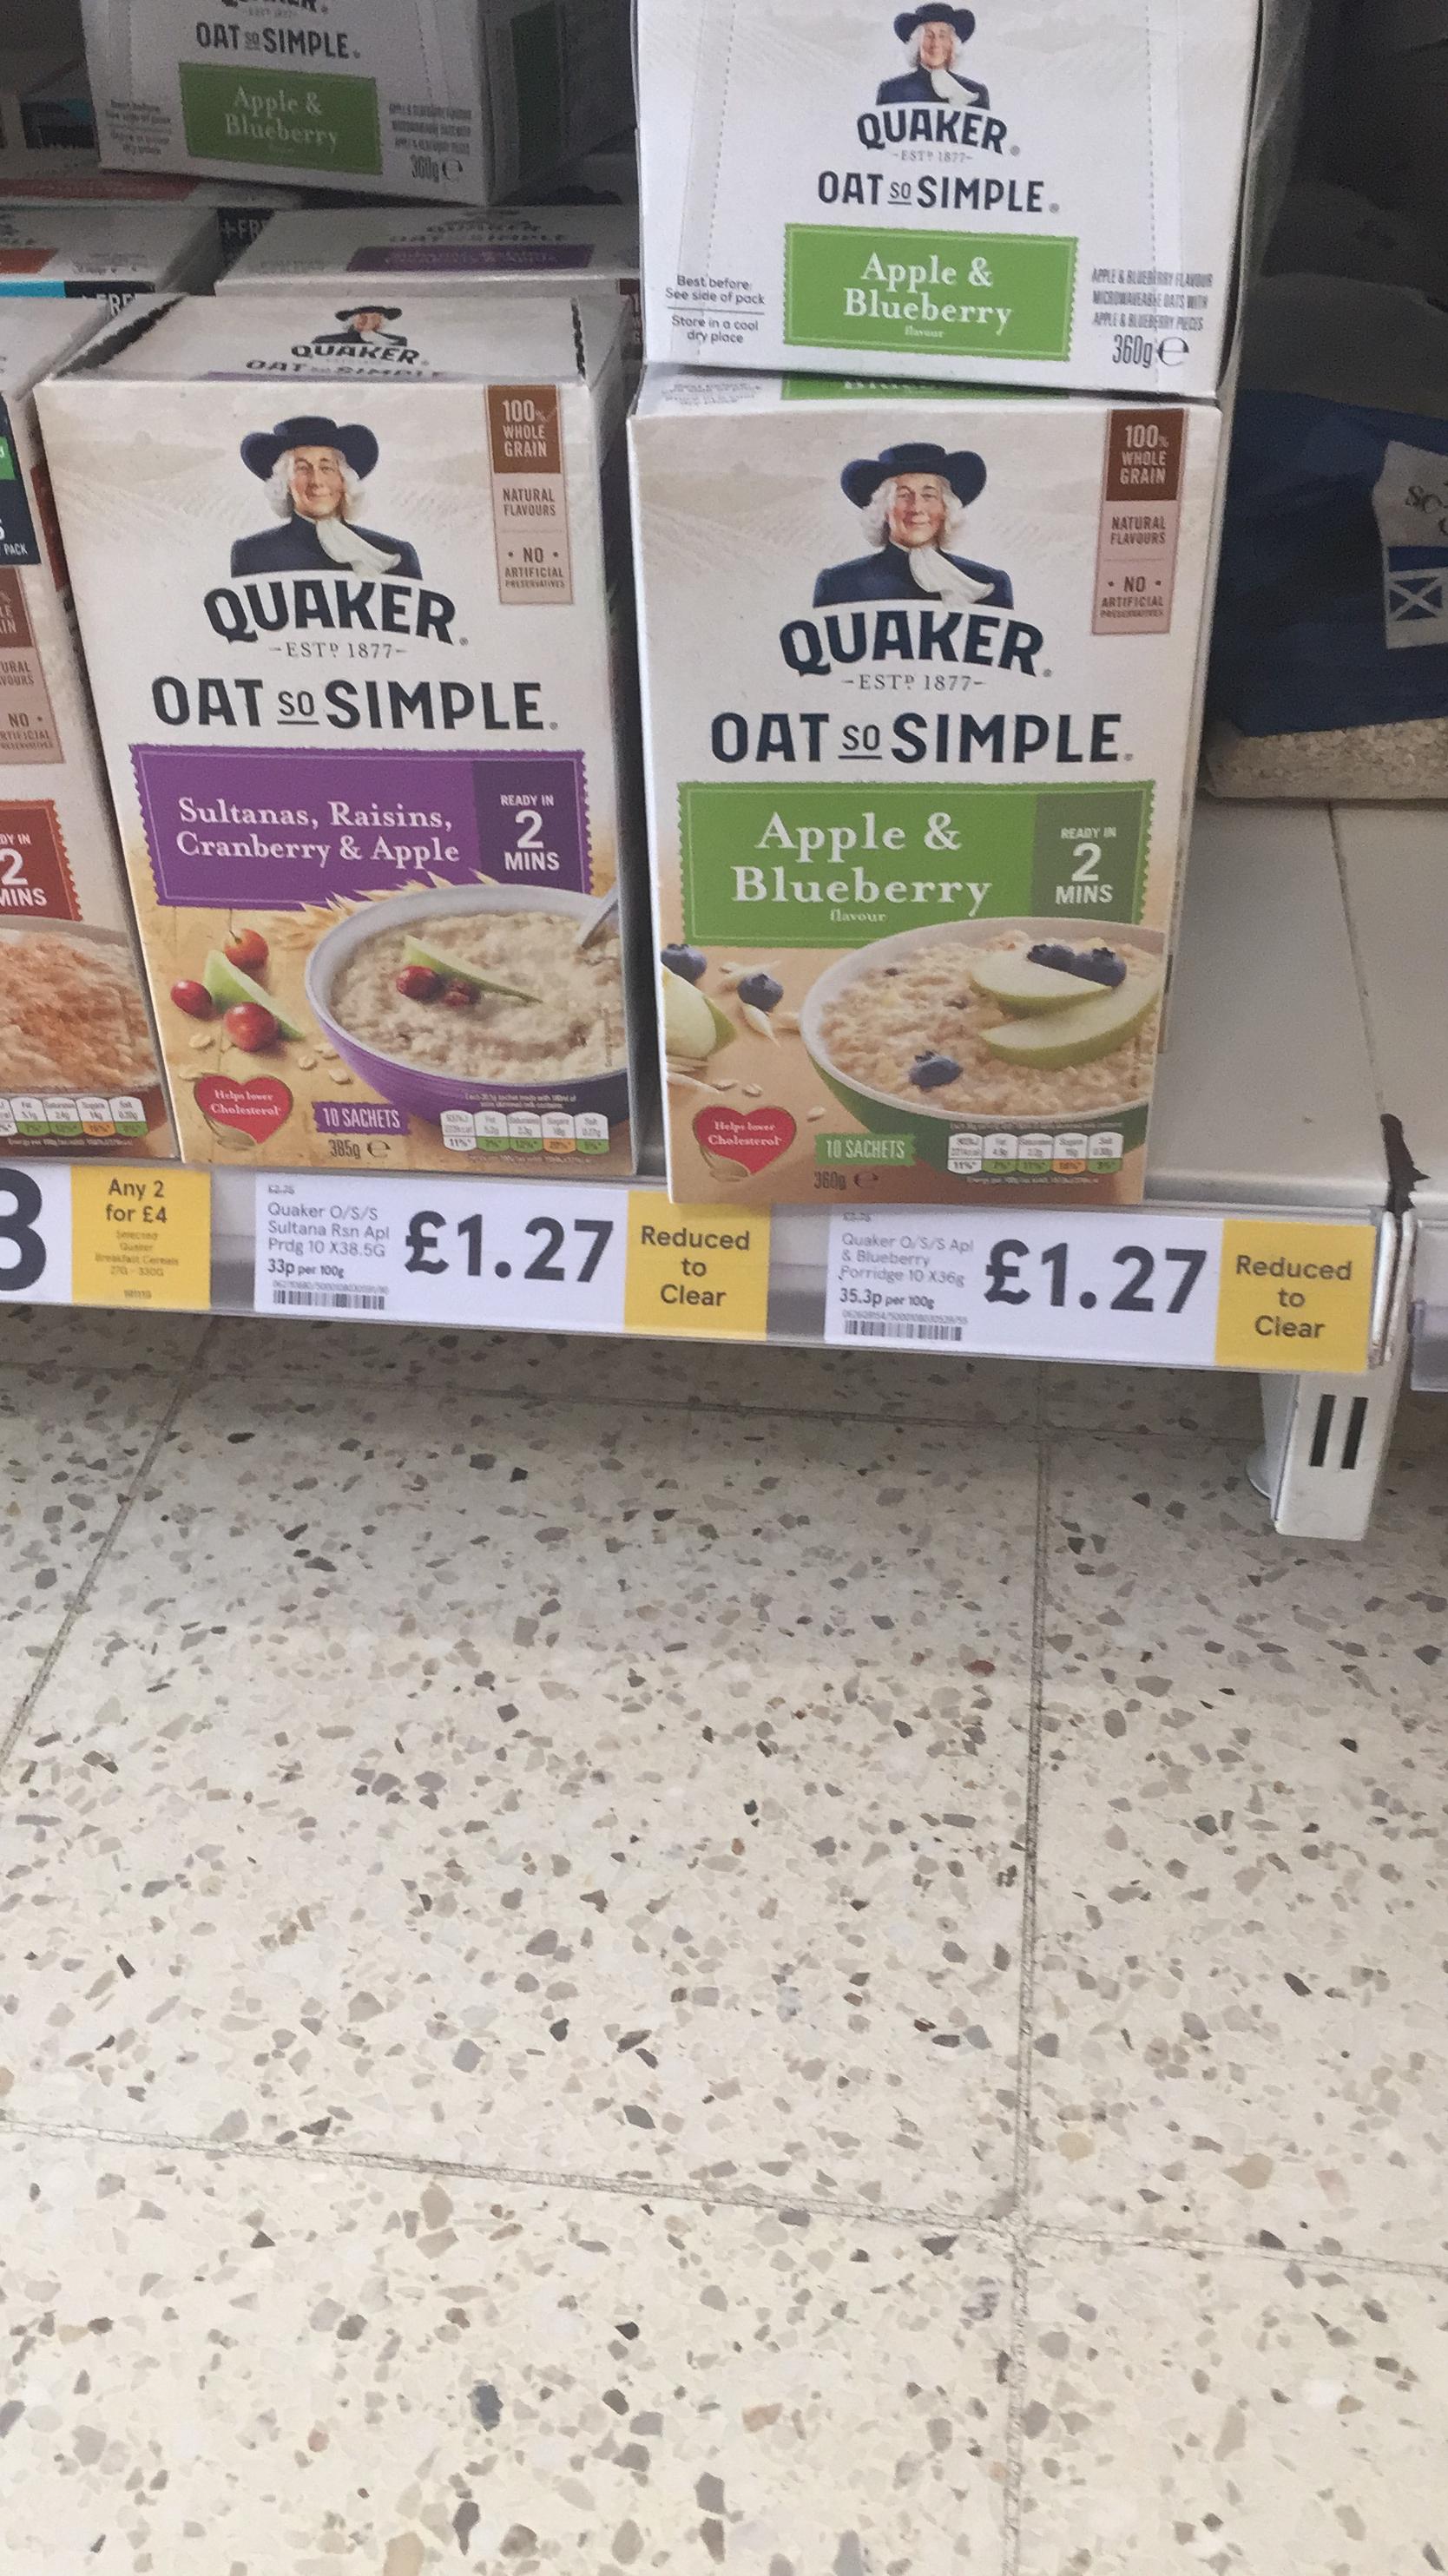 Quaker oat so simple 10 pack - 2 flavours £1.27 instore @ Tesco (Sheffield)